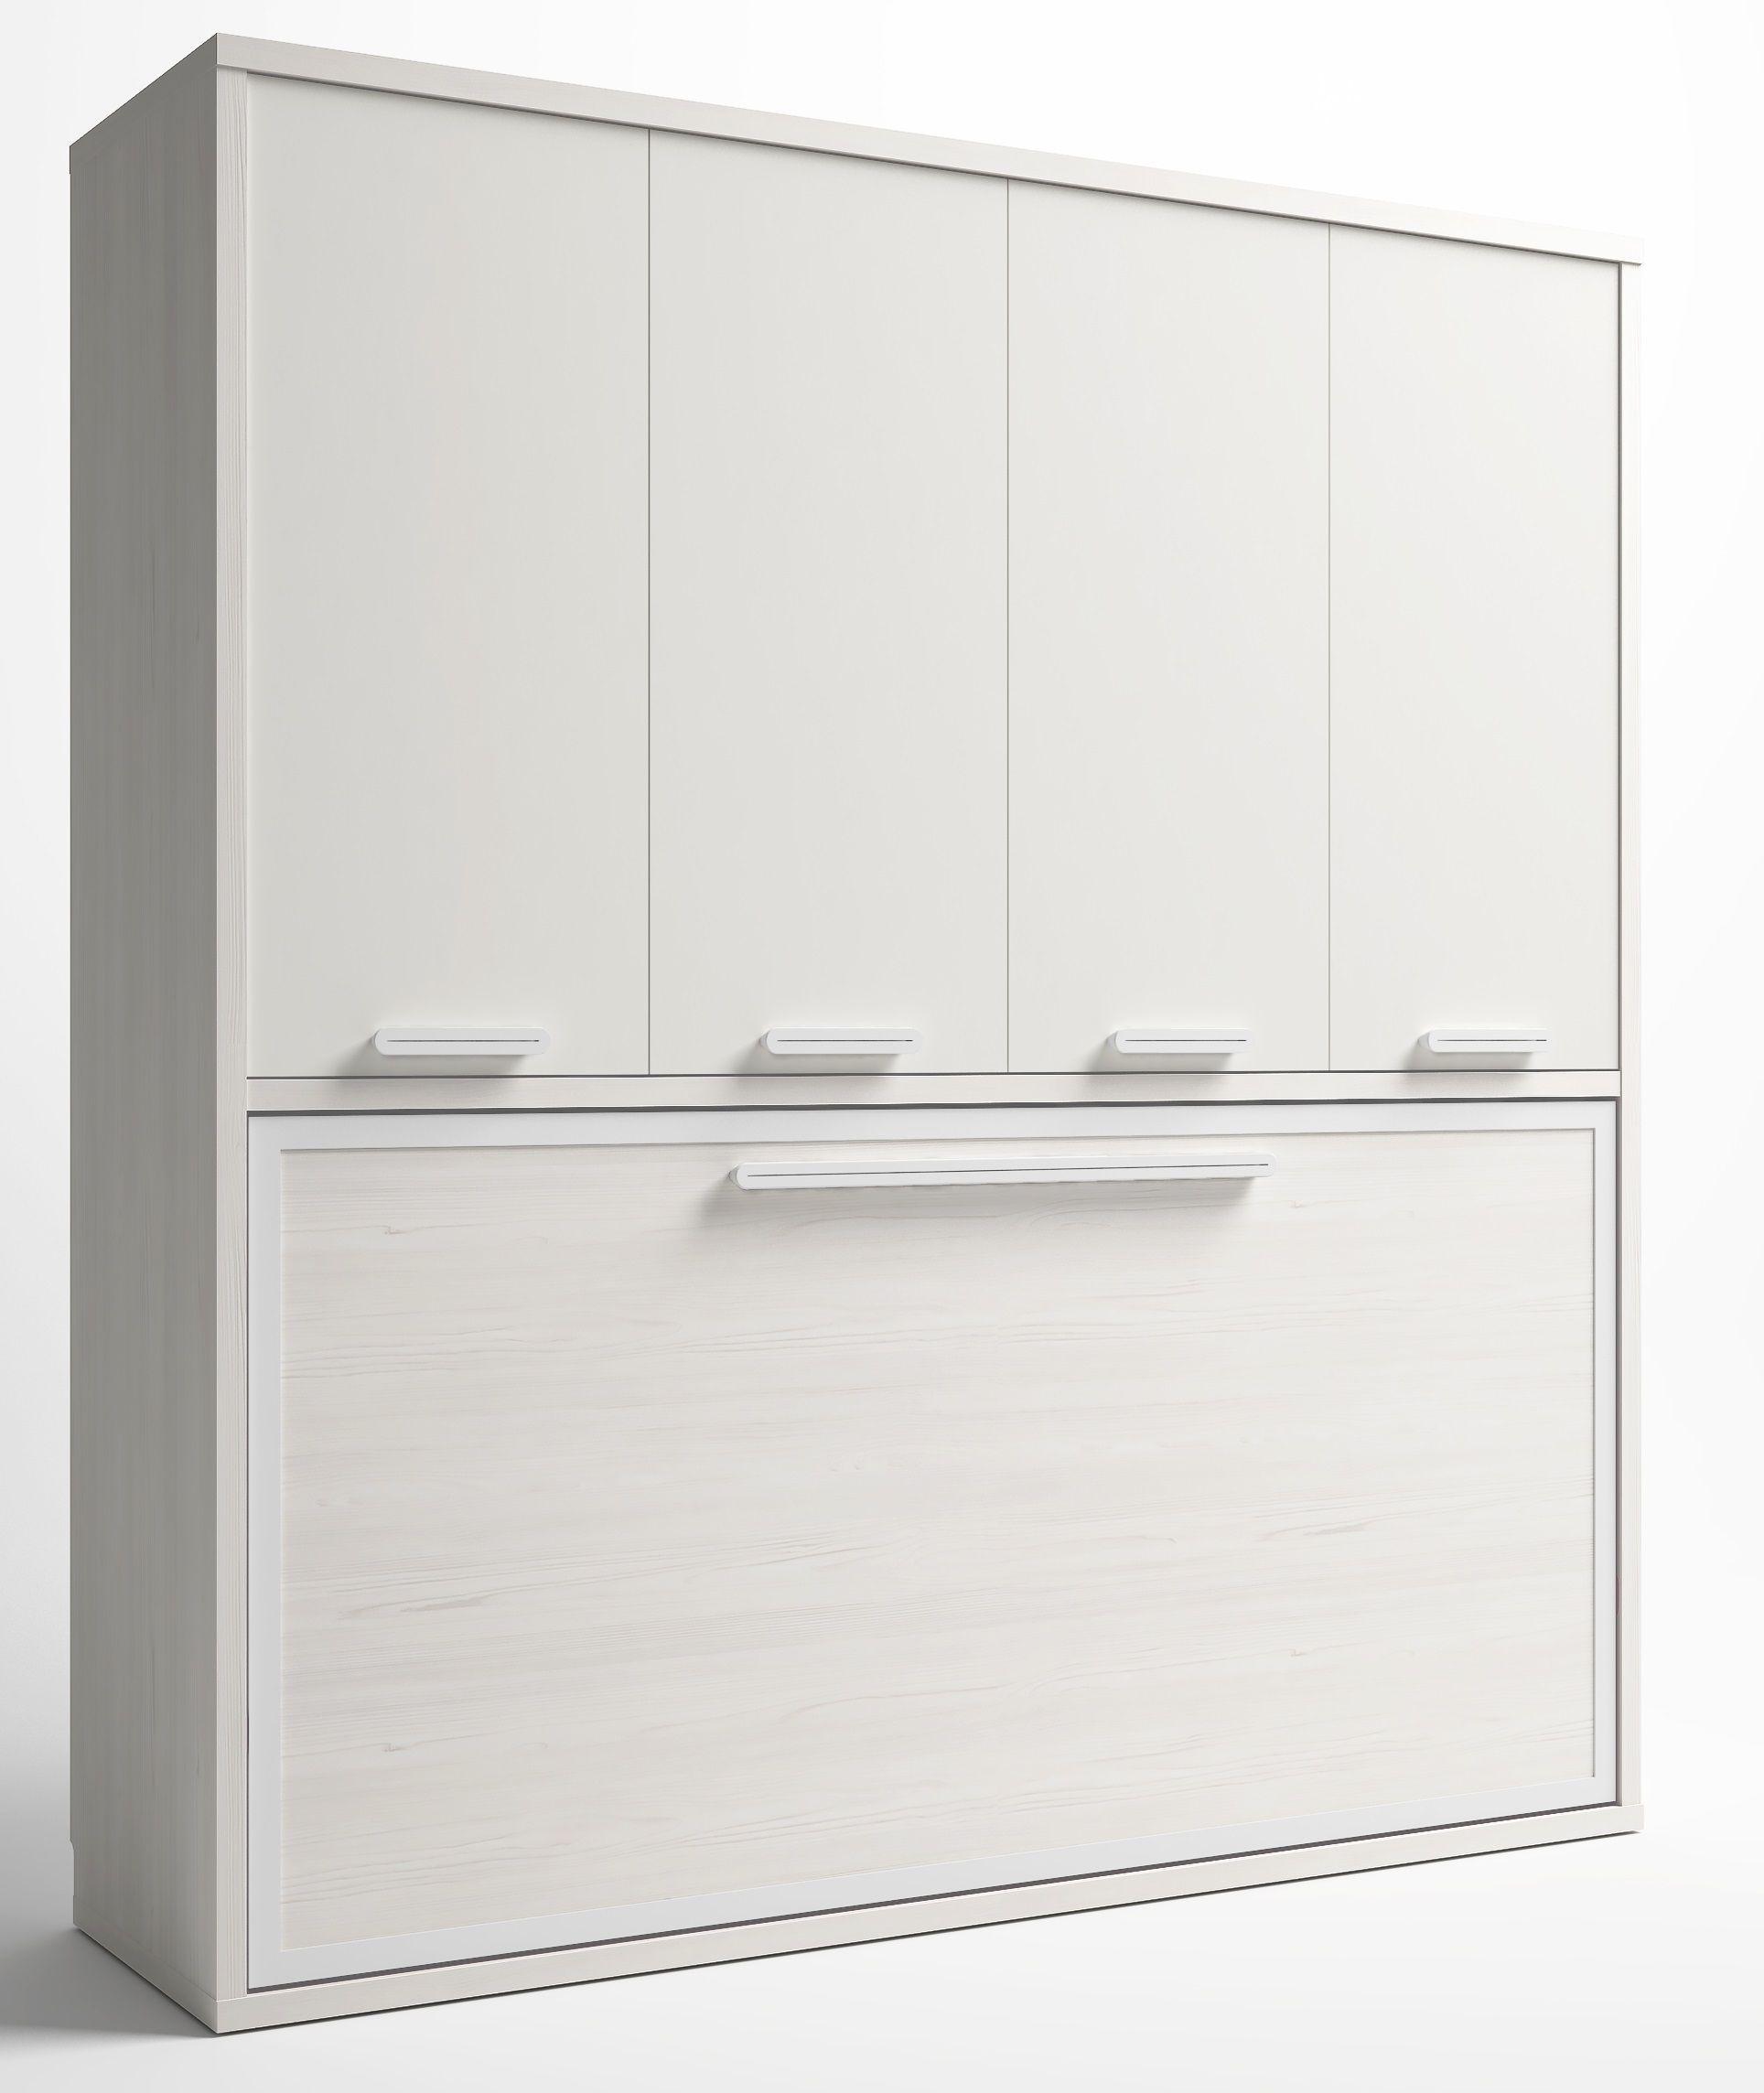 Conforama 699 dormitorios pinterest puertas for Camas ninos conforama